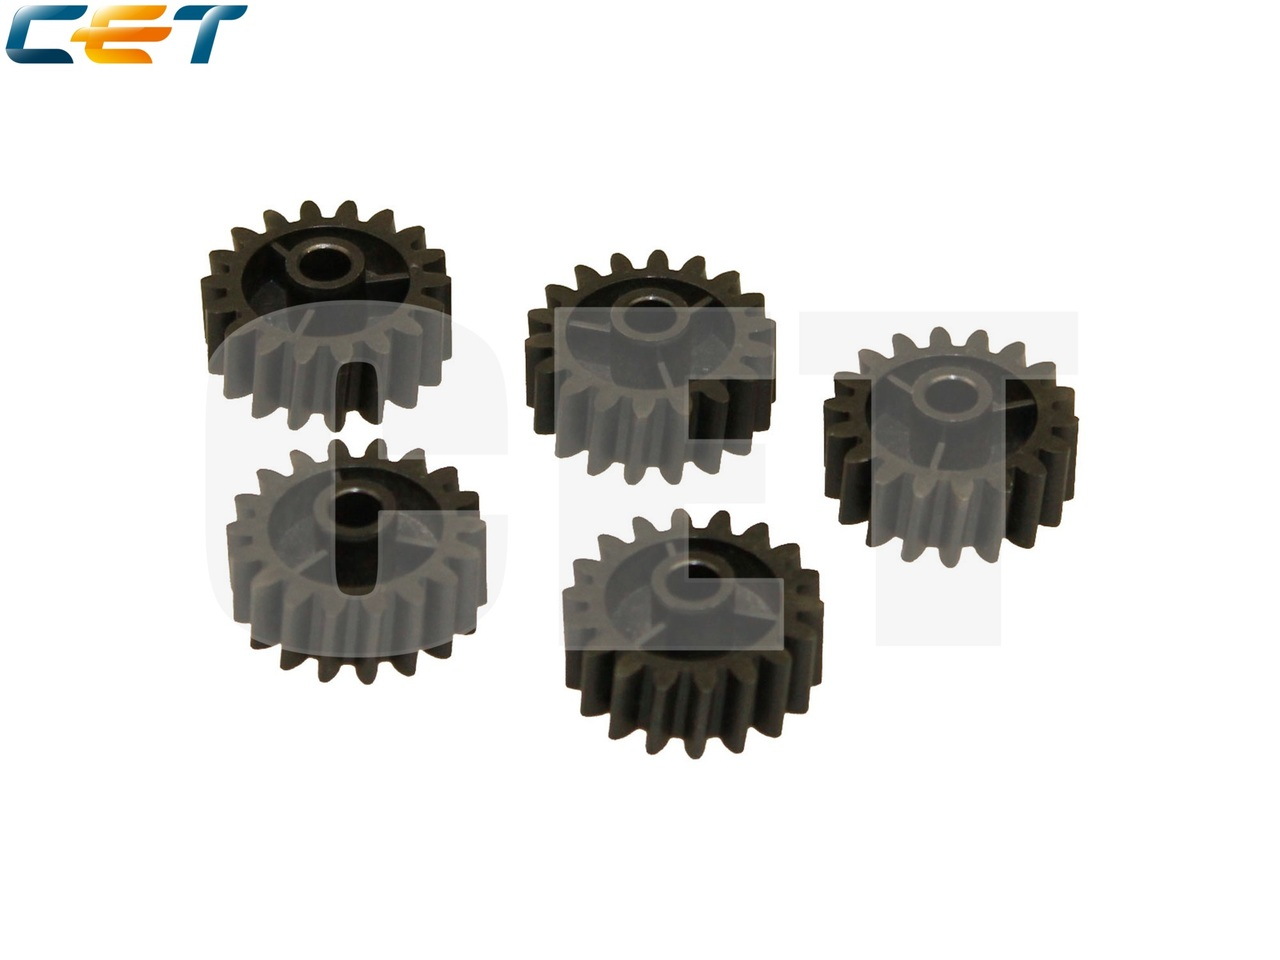 Шестерня фьюзера 18T RU7-0297-000 для HP LaserJetEnterprise 600 M601/M602/M603/M604/M605/M606/M630 (CET),CET2441